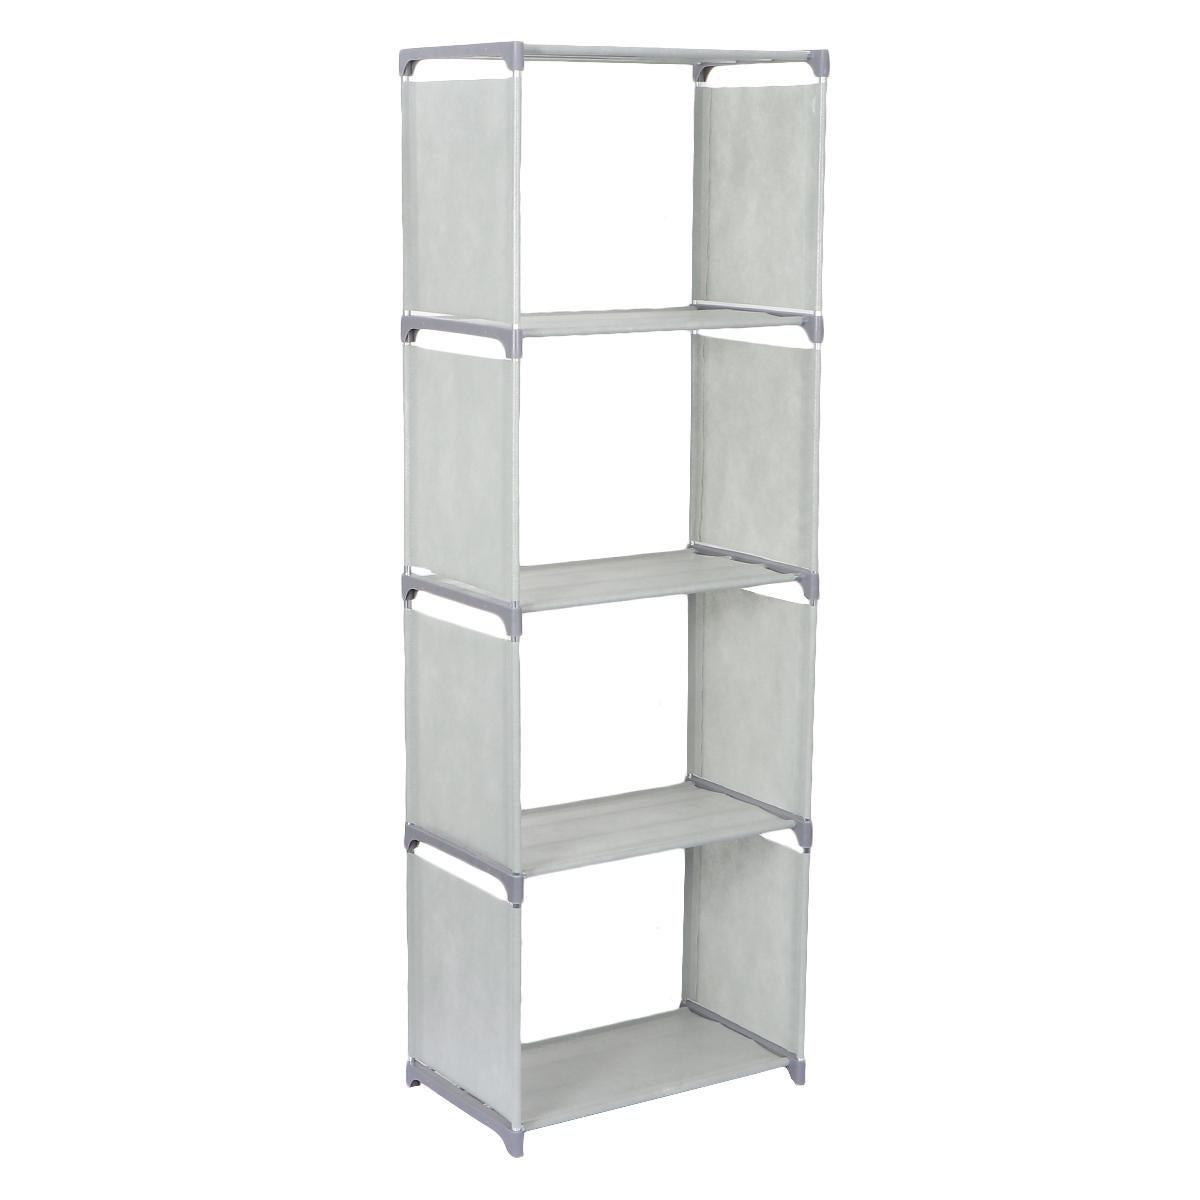 1pc Diy Simple Table Bookshelf Desktop Bookcase Modern Book Rack Book Board For Home Study Office 5 Layers Grey Matt Blatt